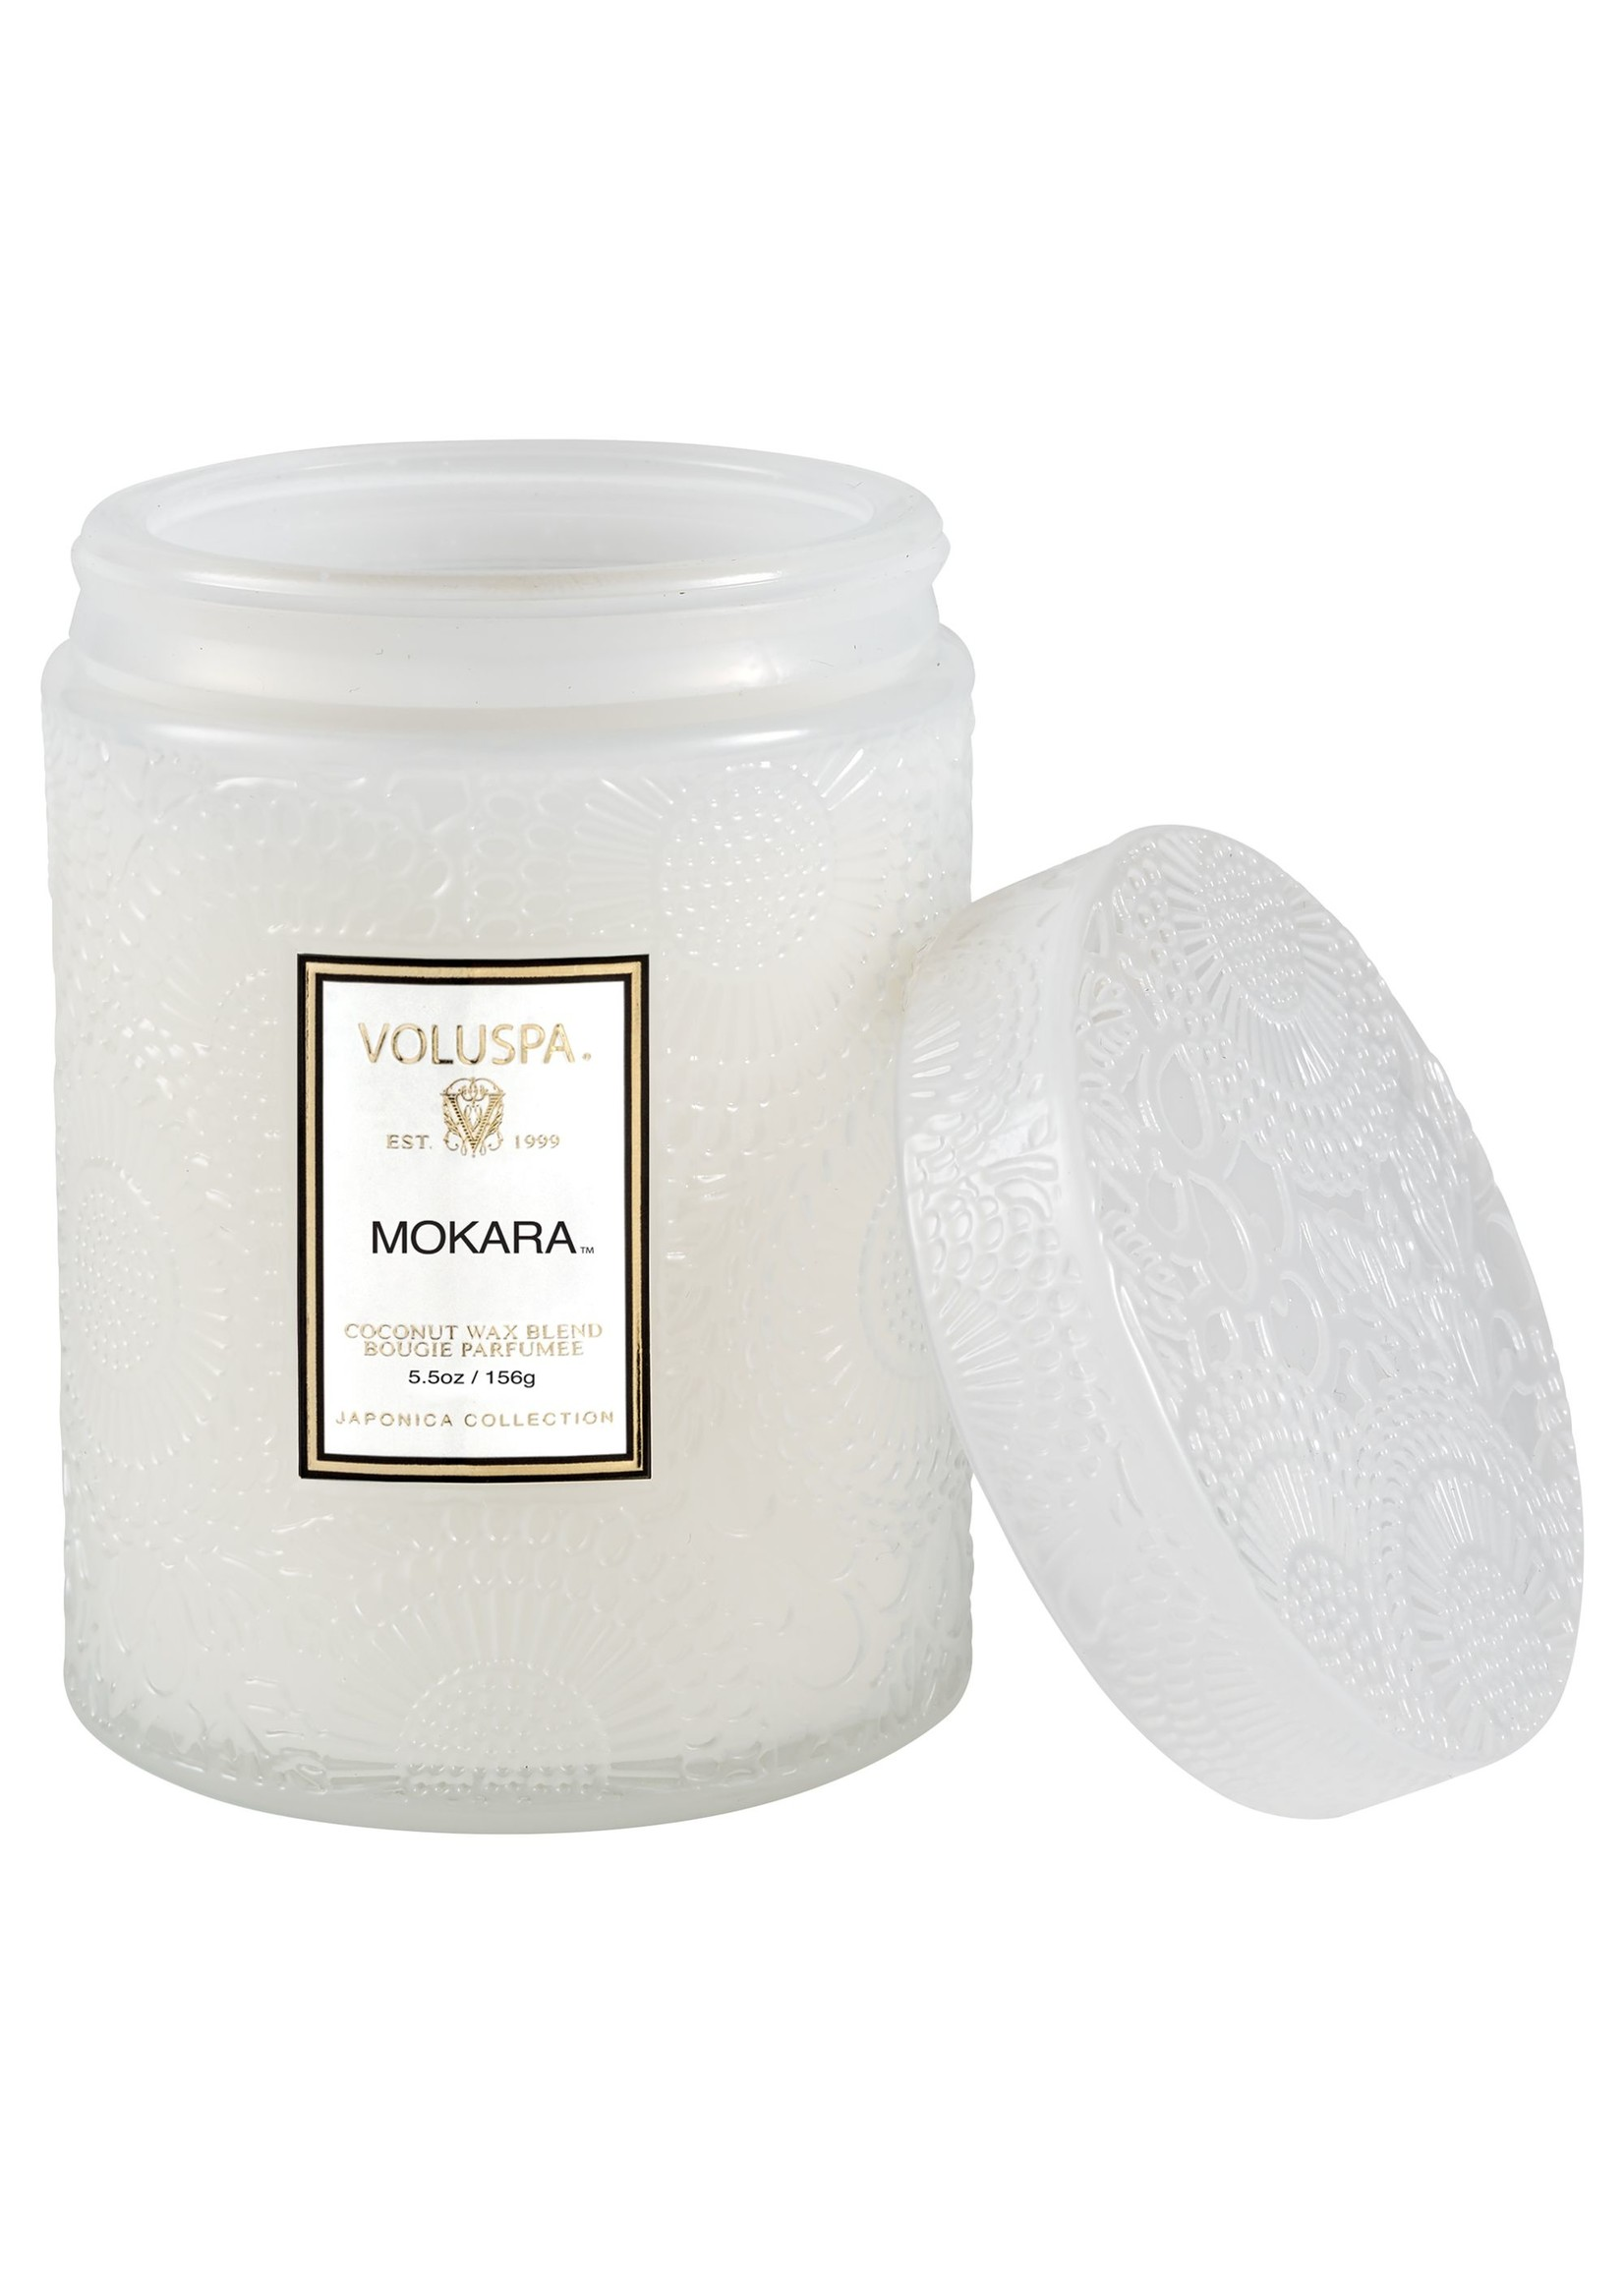 Voluspa Mokara Small Jar Candle